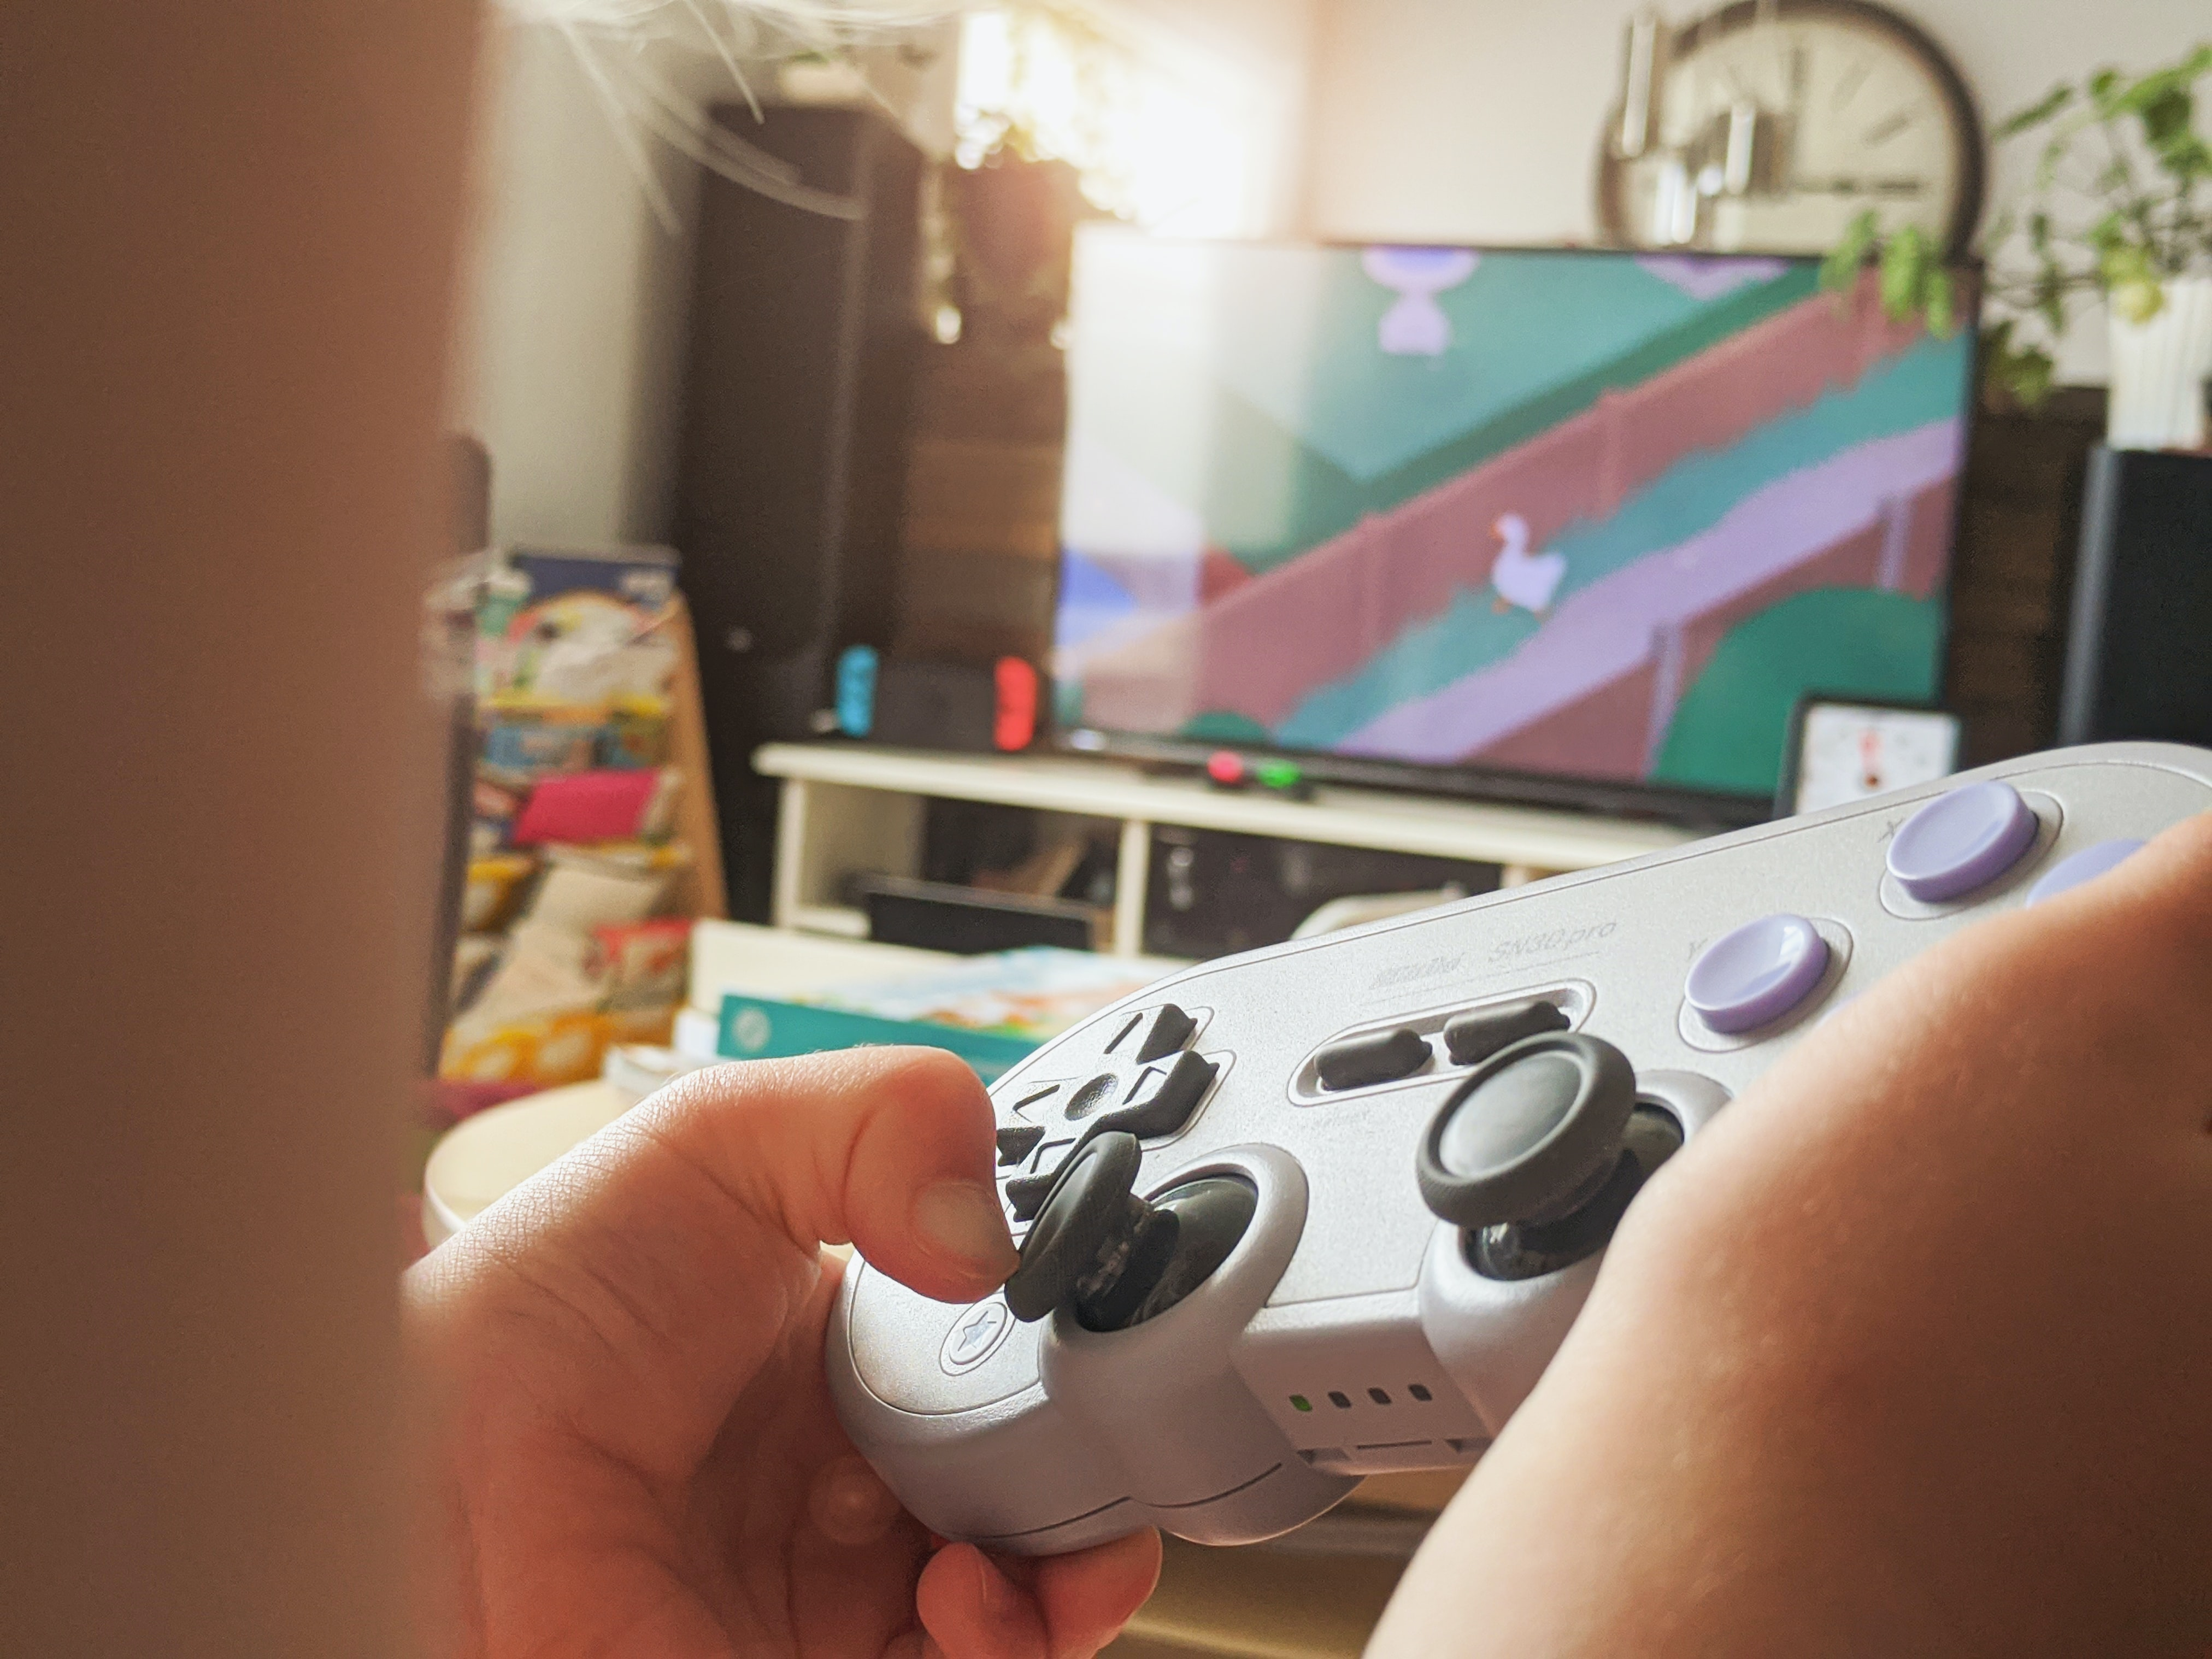 A gamer enjoying Untitled Goose Game on their TV.